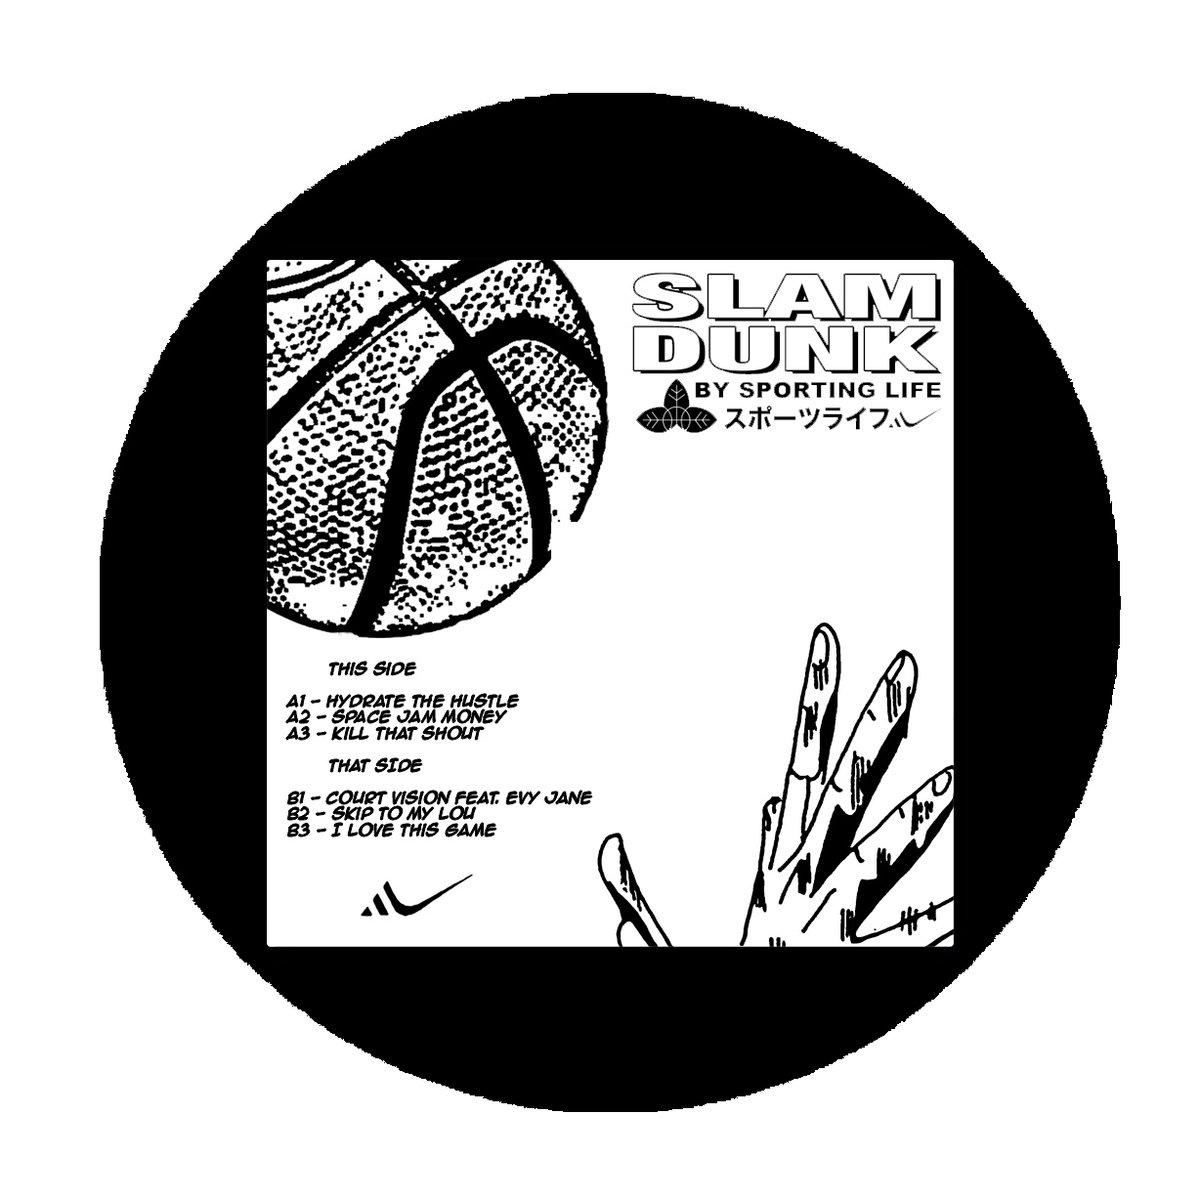 1200x1200 Slam Dunk